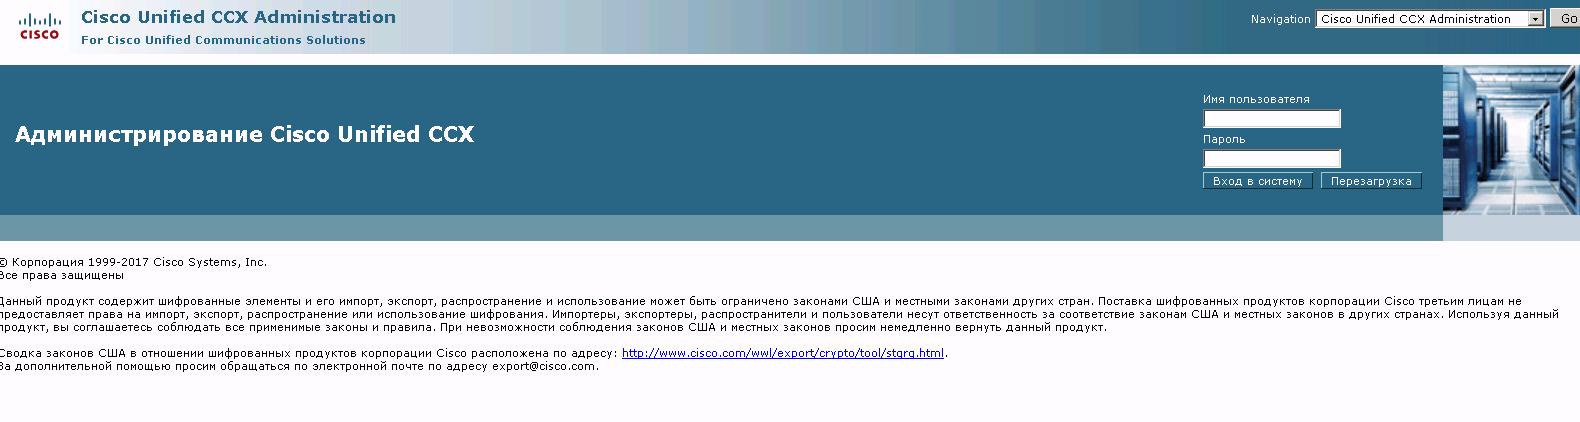 Cisco UCCX интерфейс